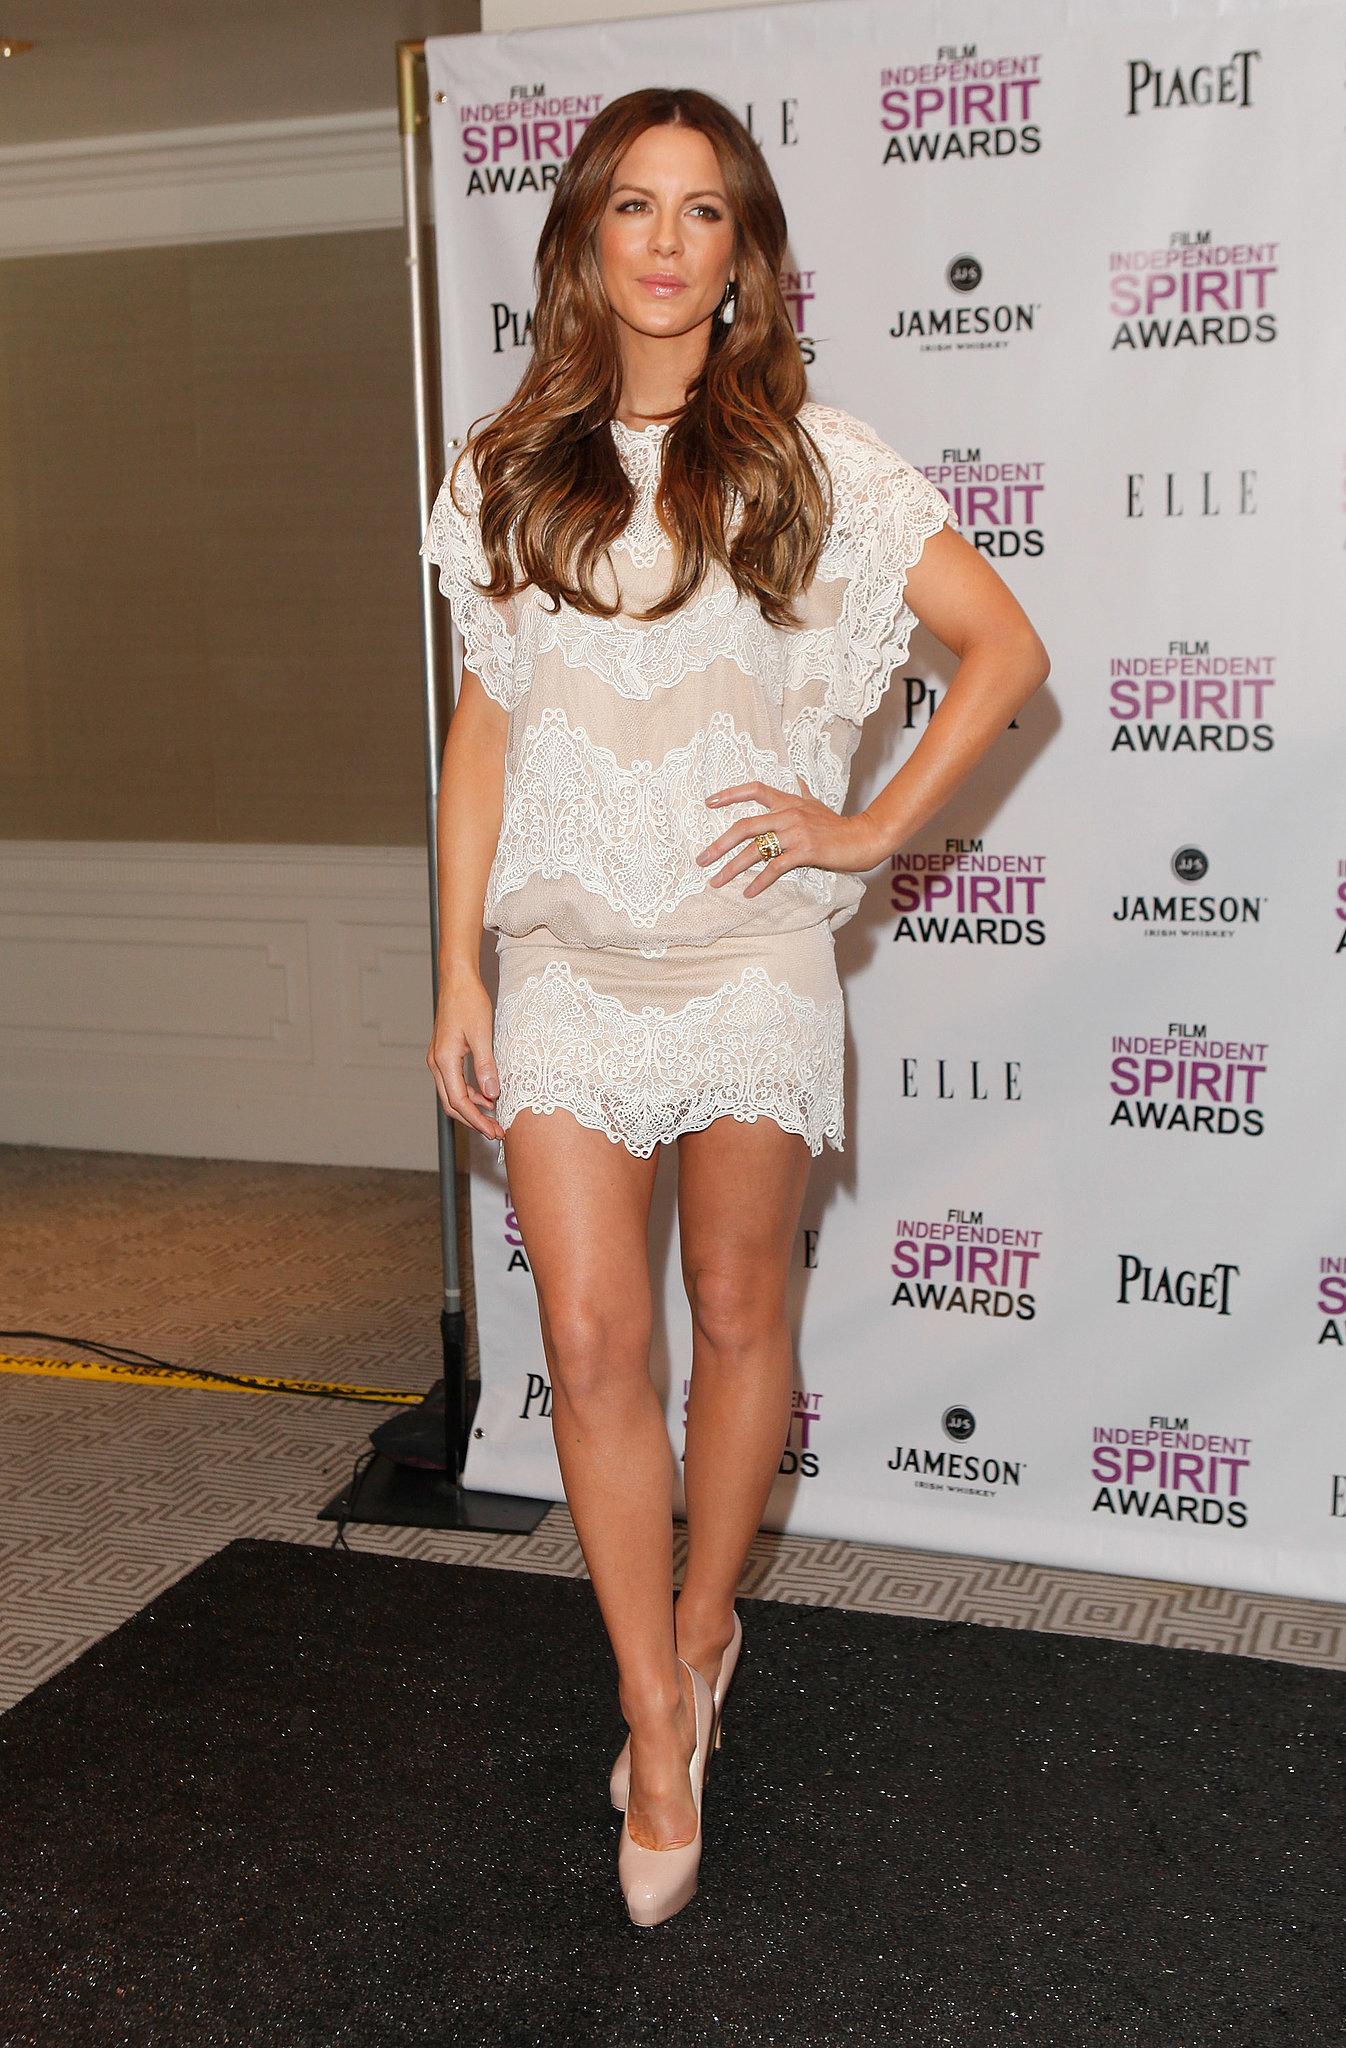 In November 2011, Kate Beckinsale rocked a short white lace number at the Film Independent Spirit Awards press conference in LA.